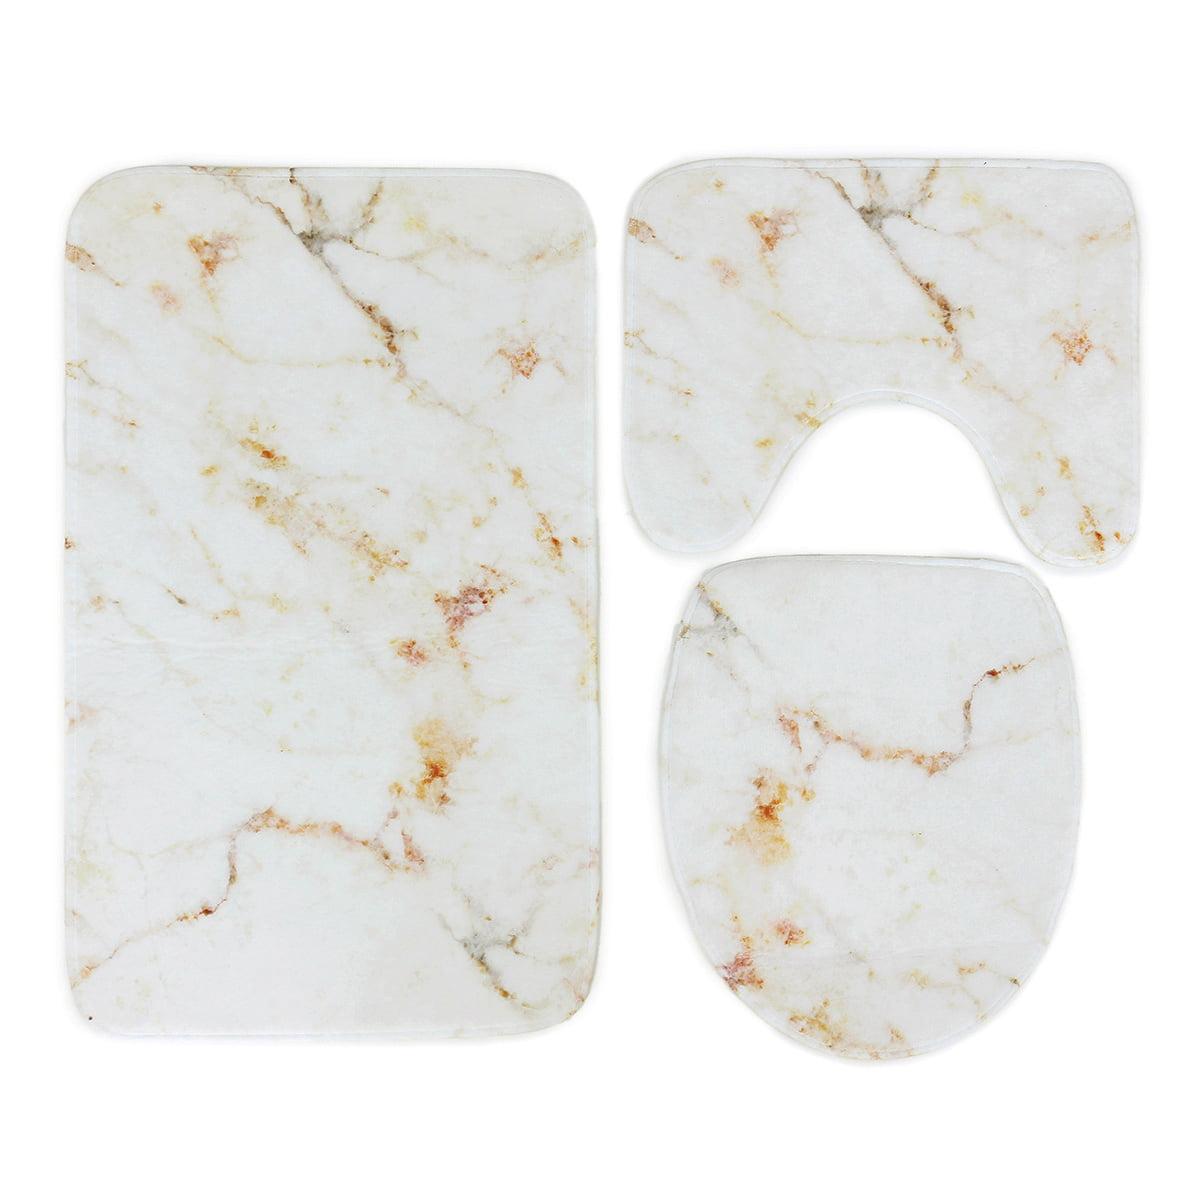 3Pcs Set Marble Pattern Bathroom Non-Slip Pedestal Rug Lid Toilet Cover Bath Mat